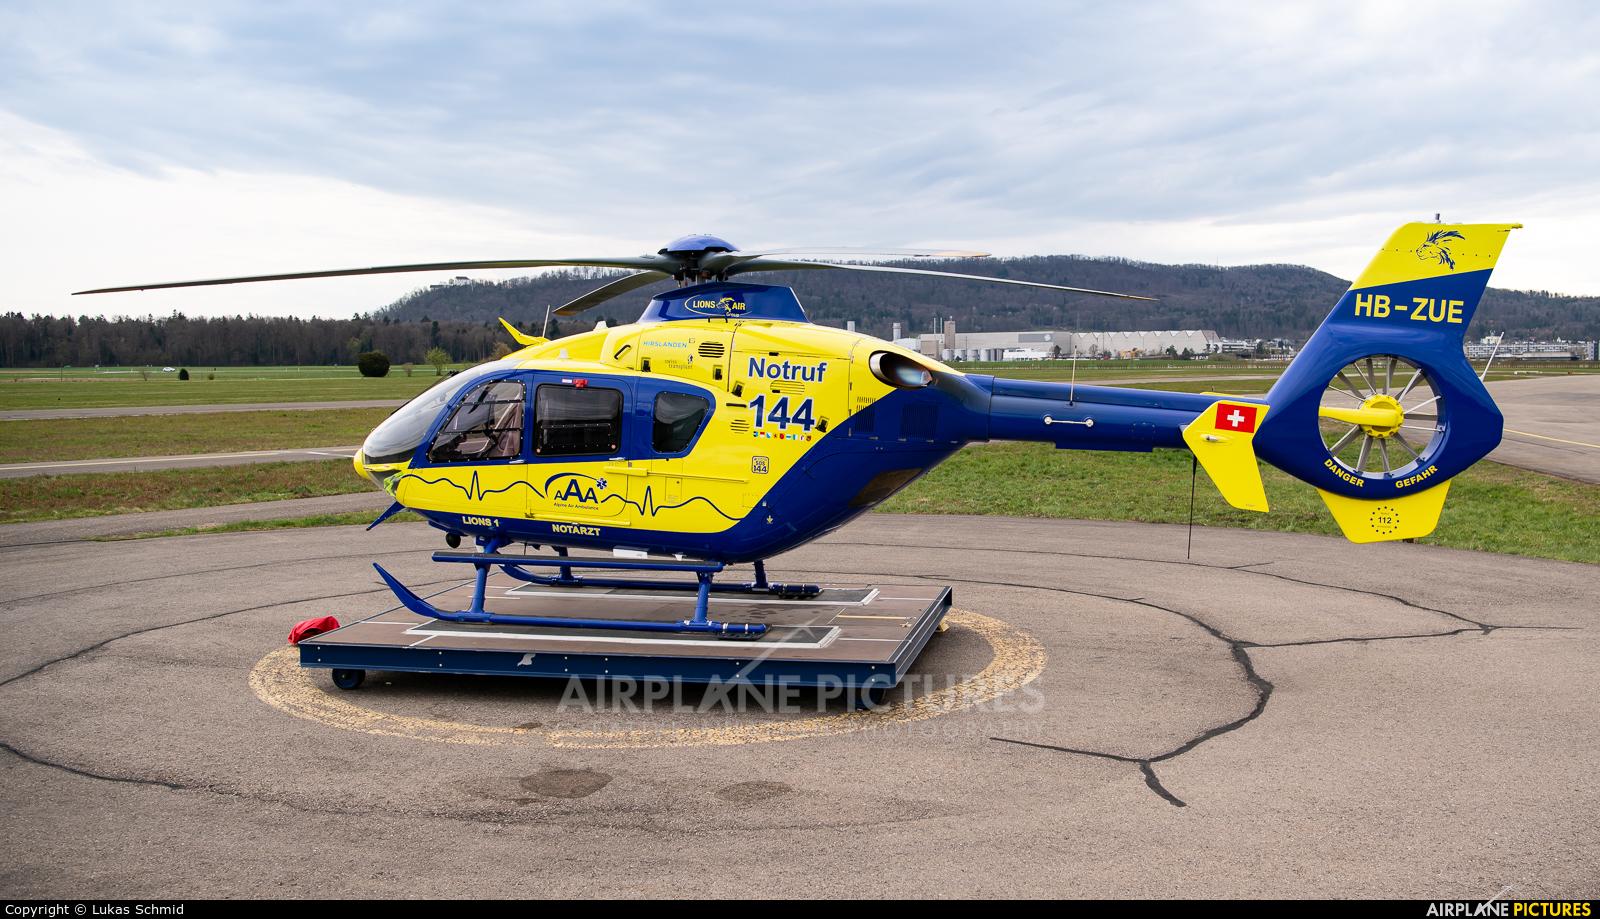 Lions Air HB-ZUE aircraft at Birrfeld